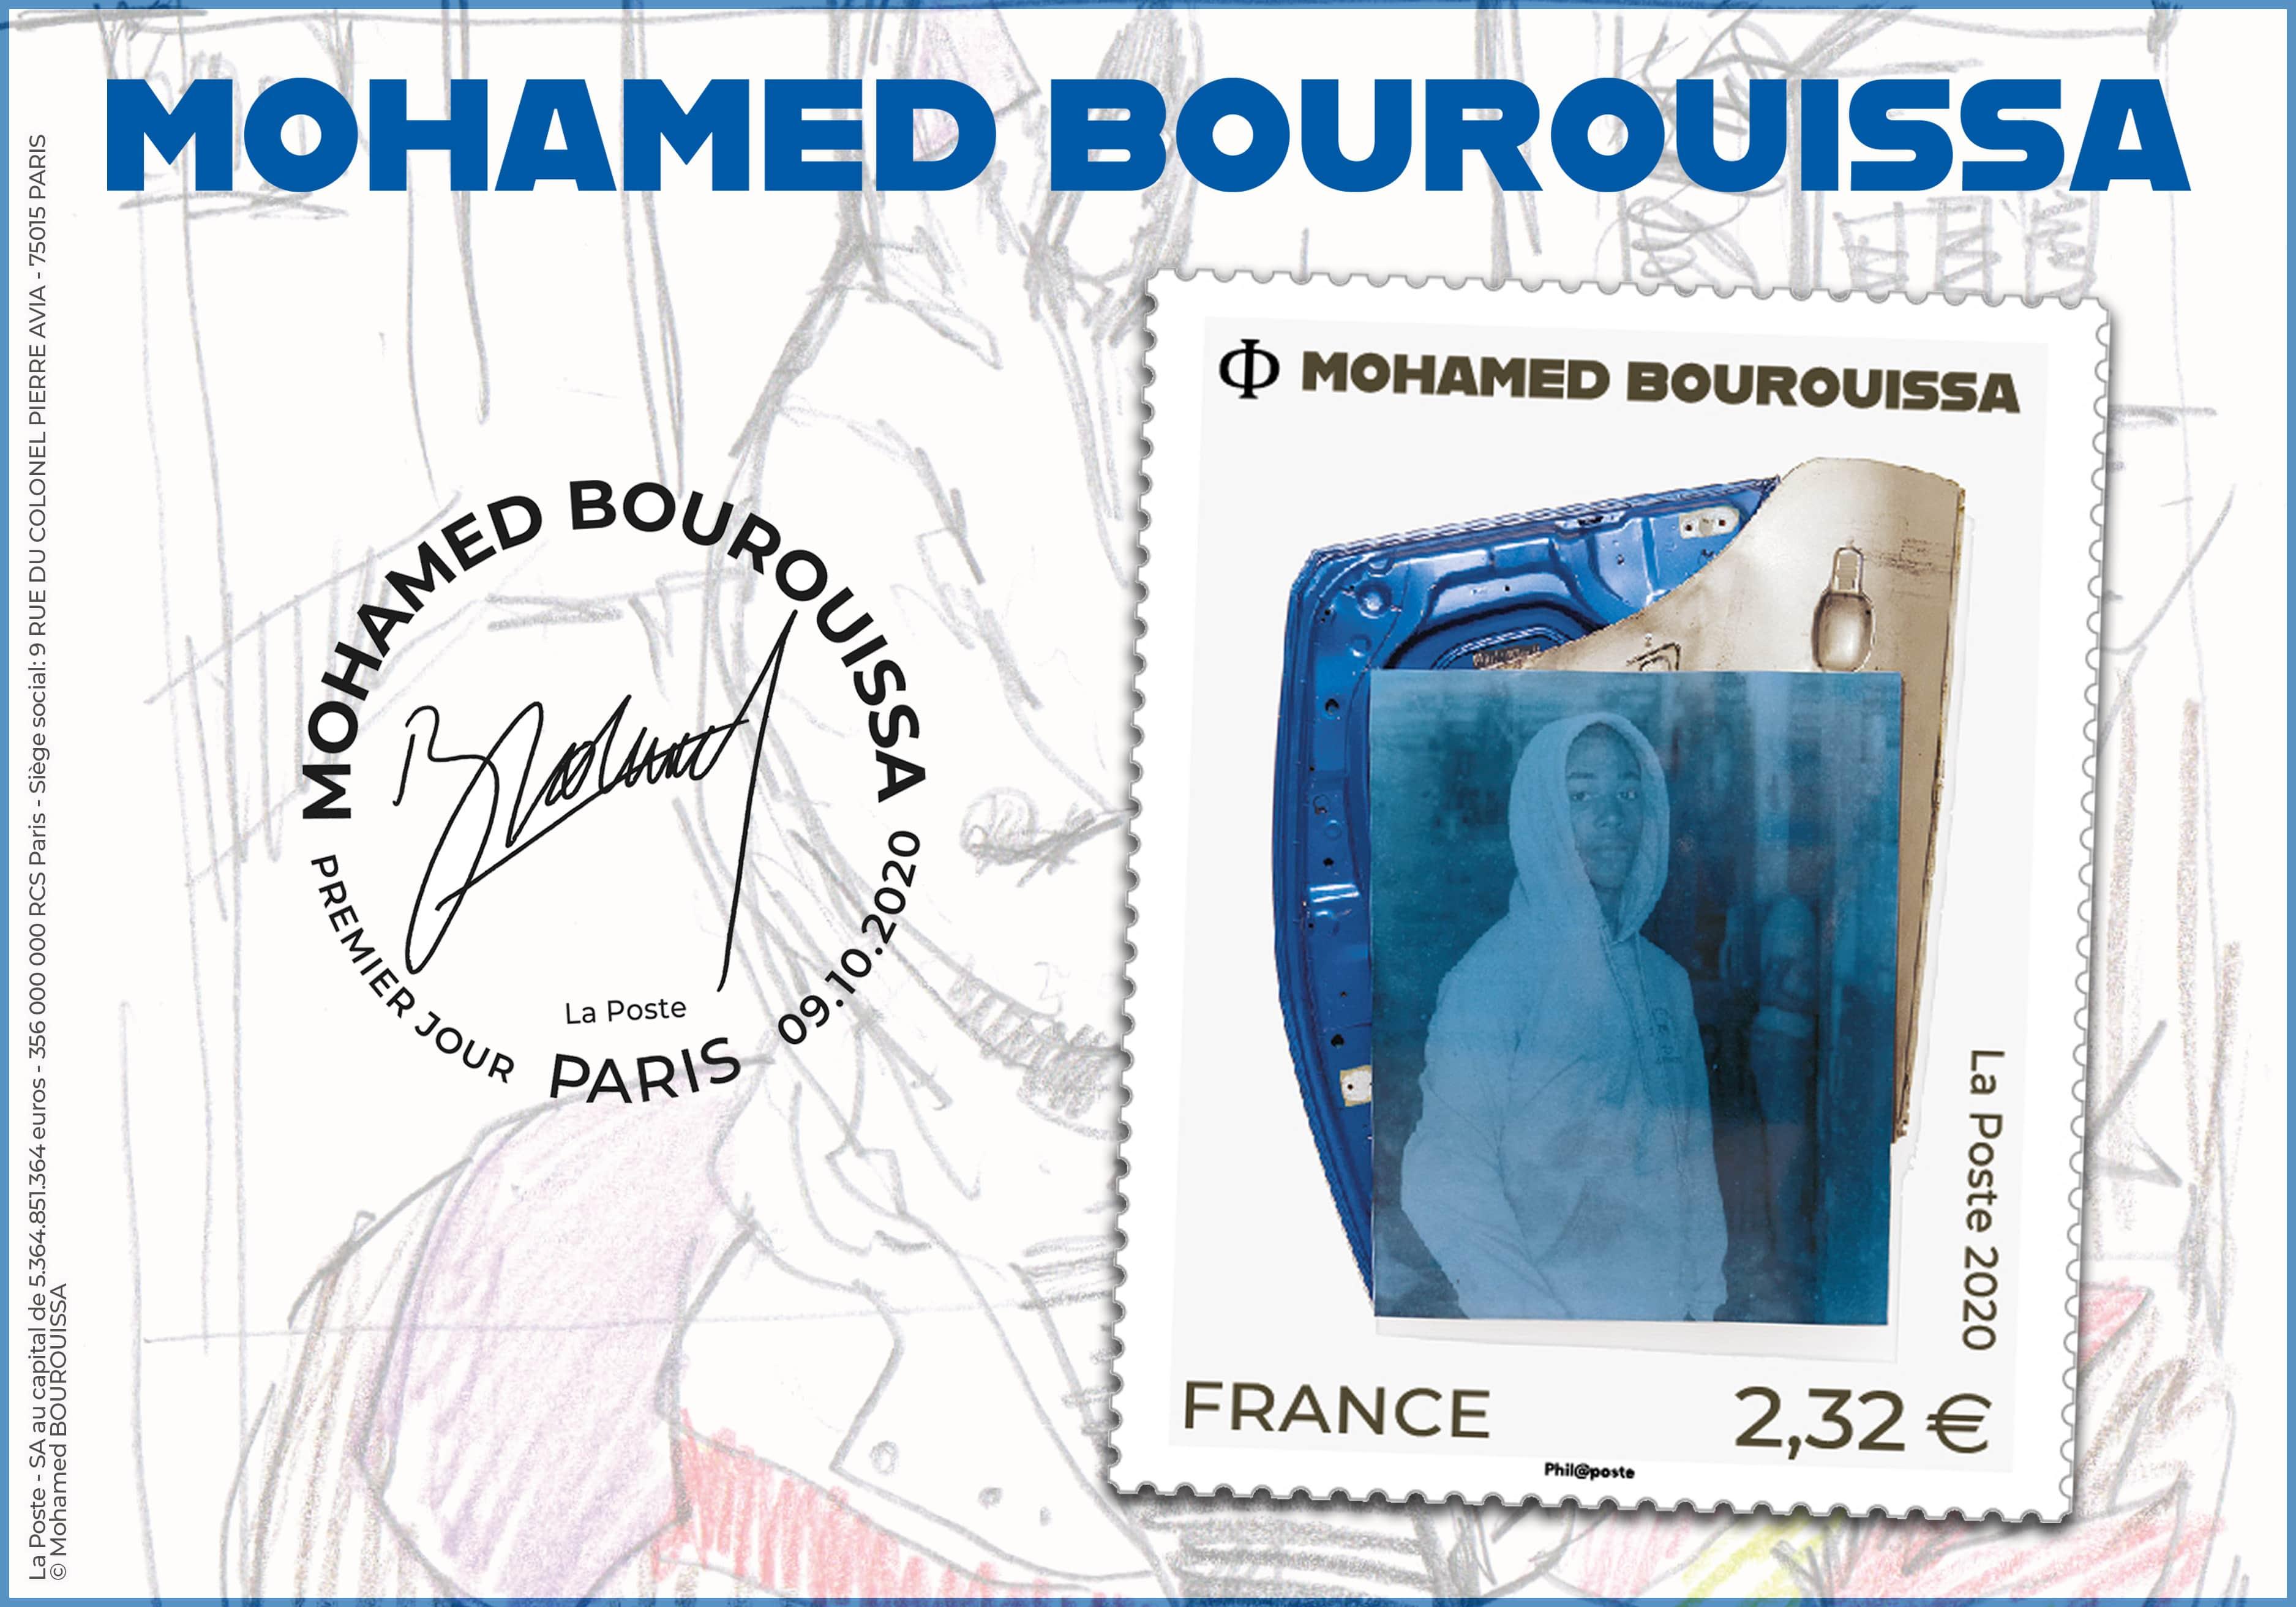 Mohamed Bourouissa